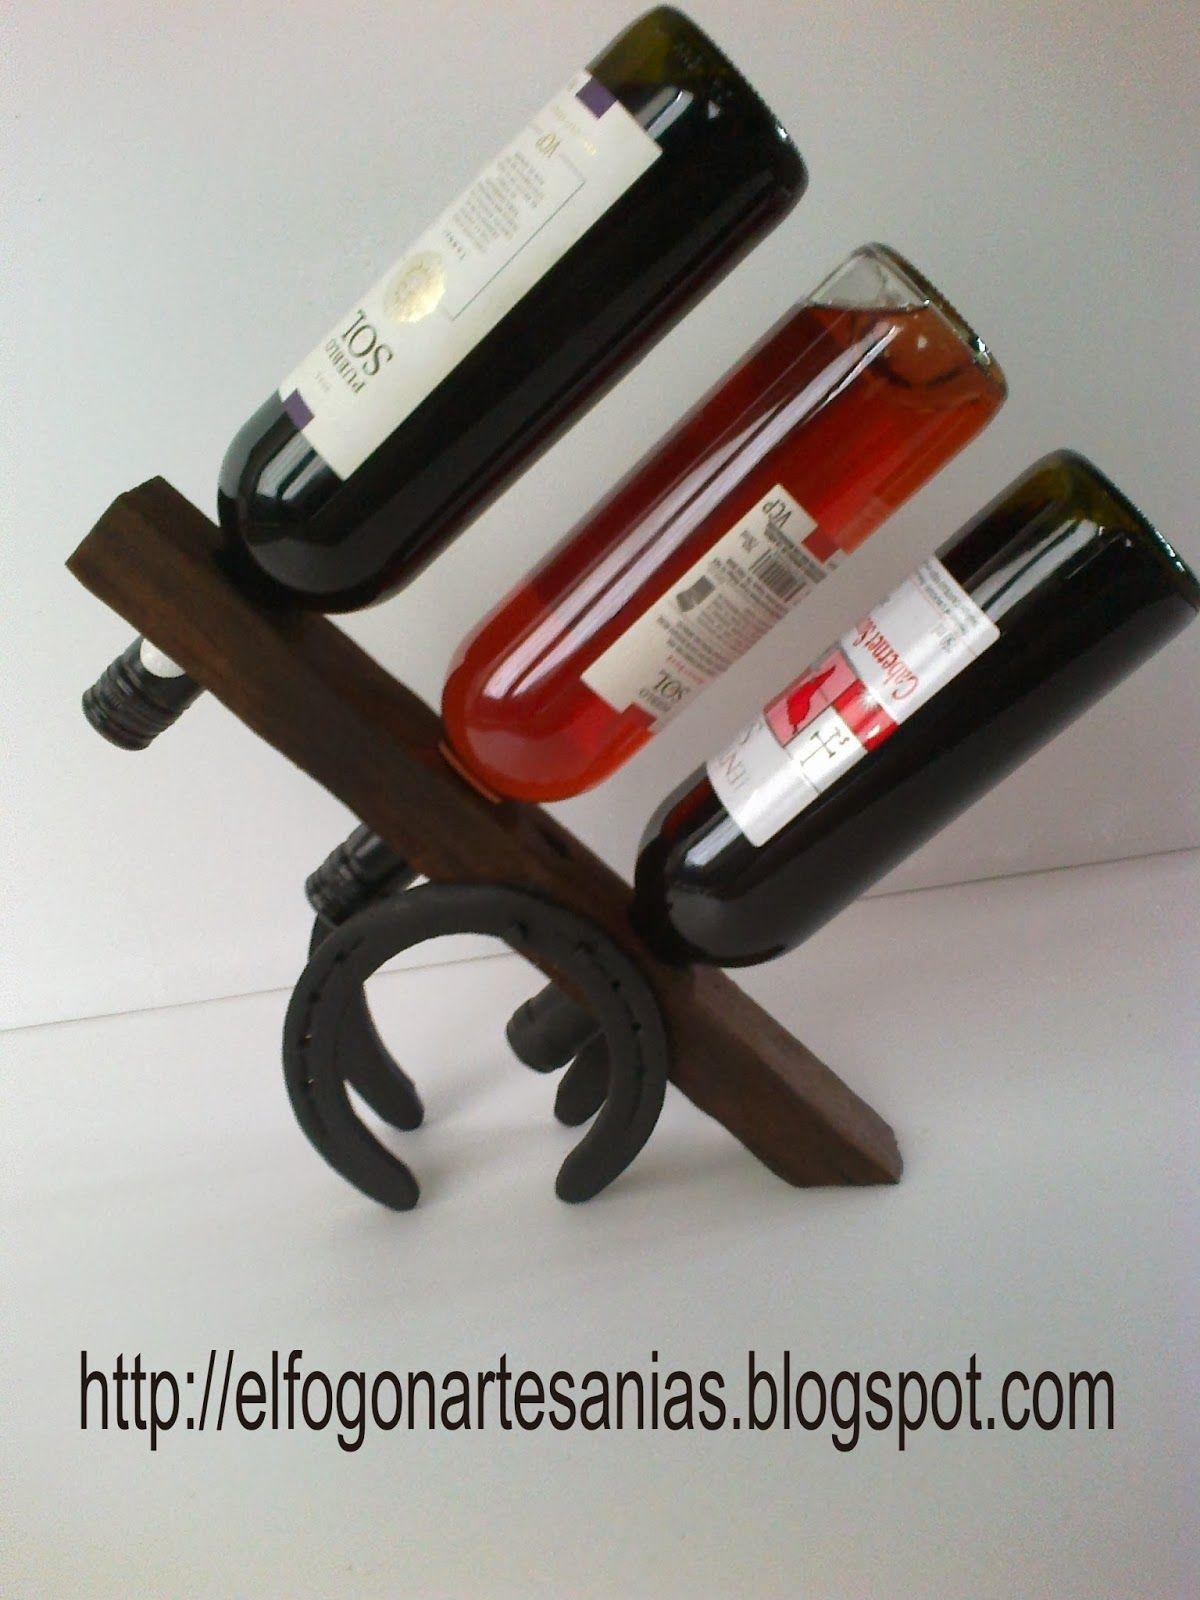 El fog n artesan as en madera r stica y hierro uruguay for Bar madera rustica